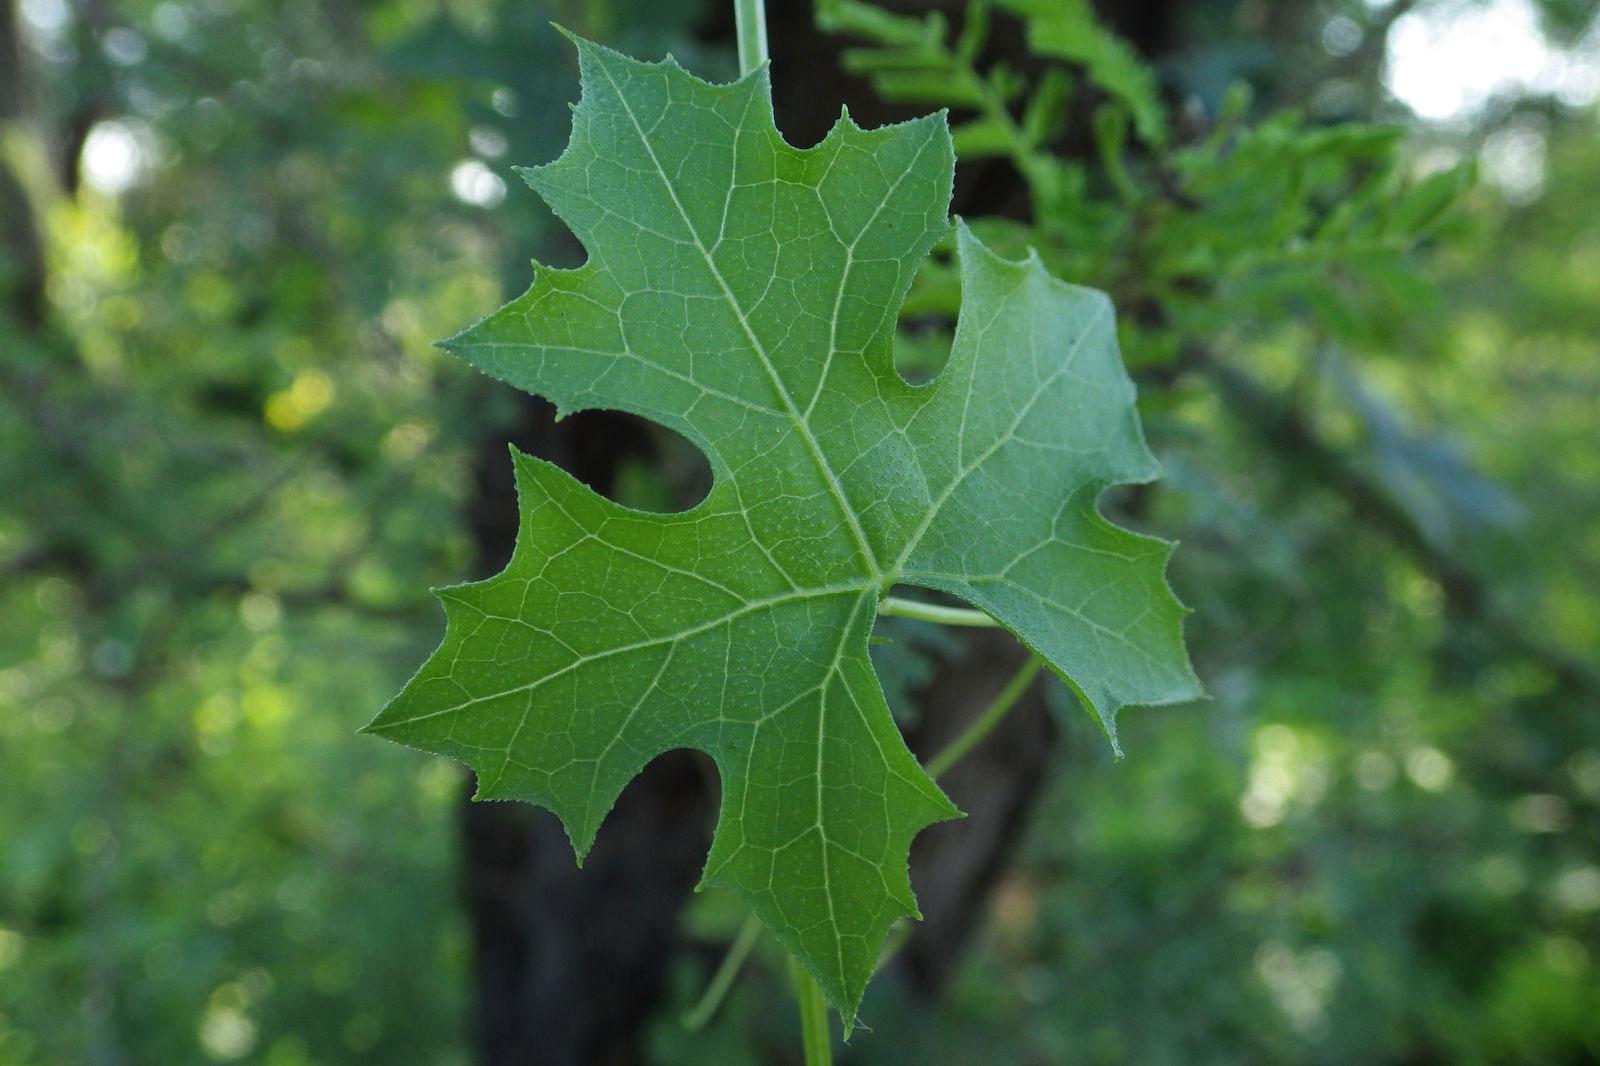 Leaves-of-Balsam-apple